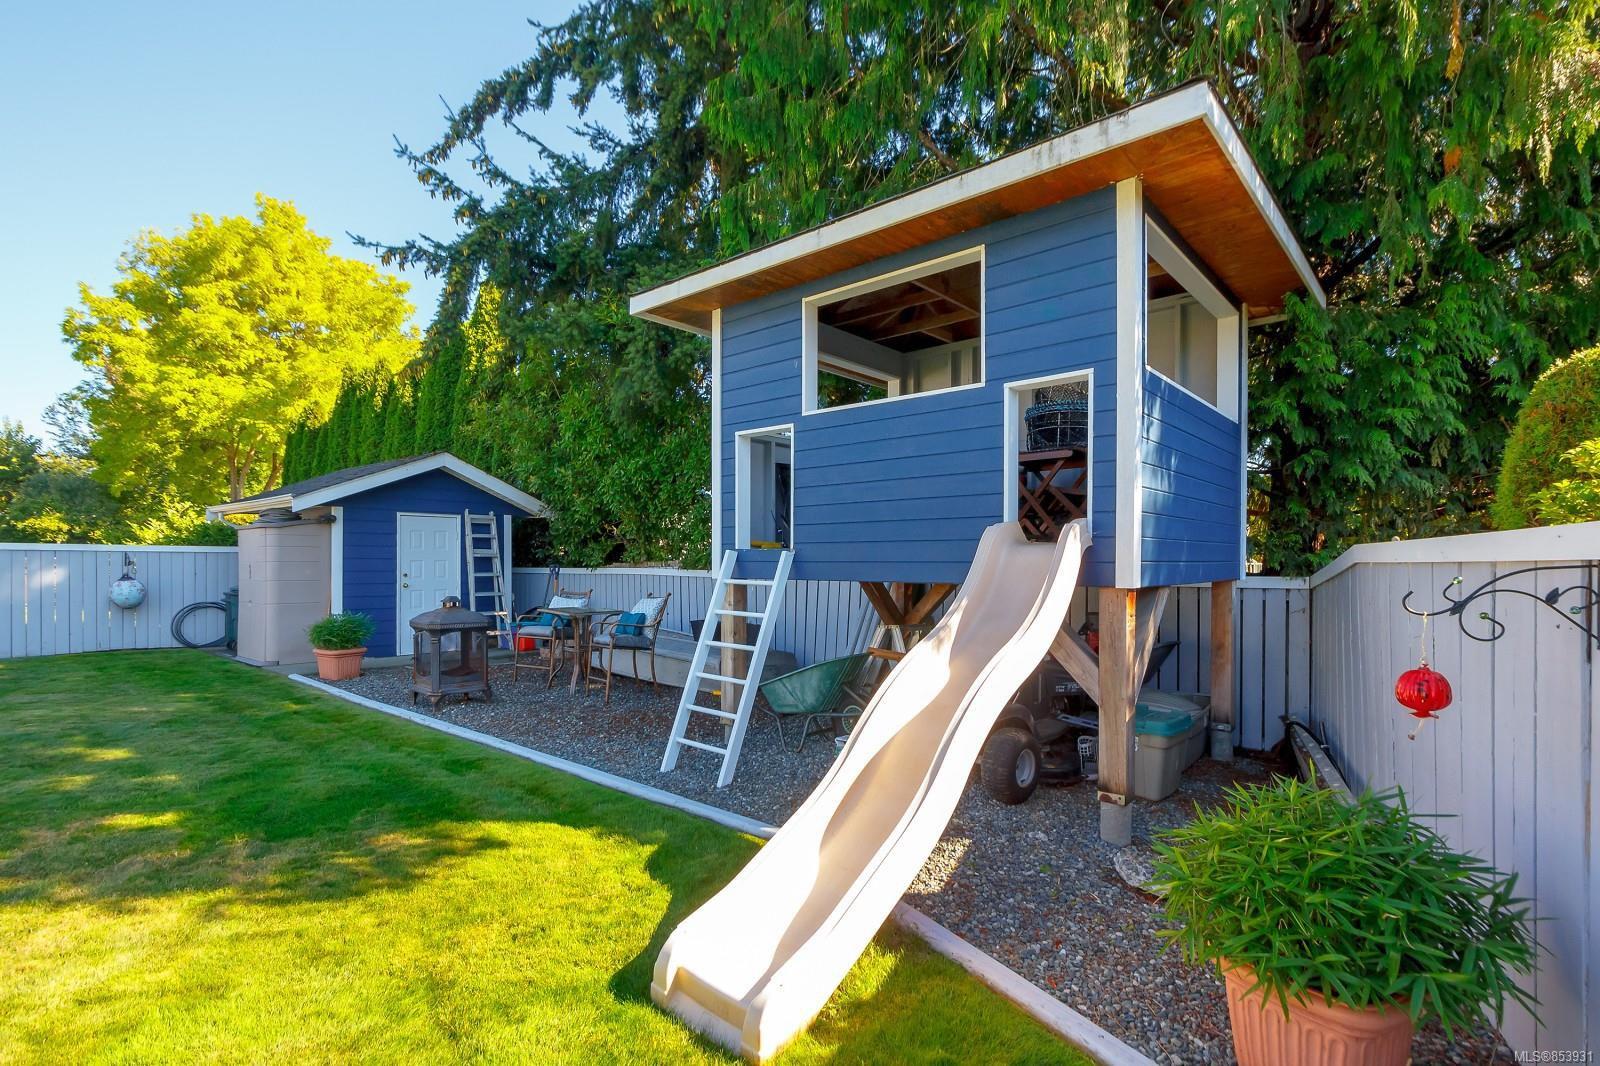 Photo 28: Photos: 2456 Timbercrest Dr in : Du East Duncan House for sale (Duncan)  : MLS®# 853931